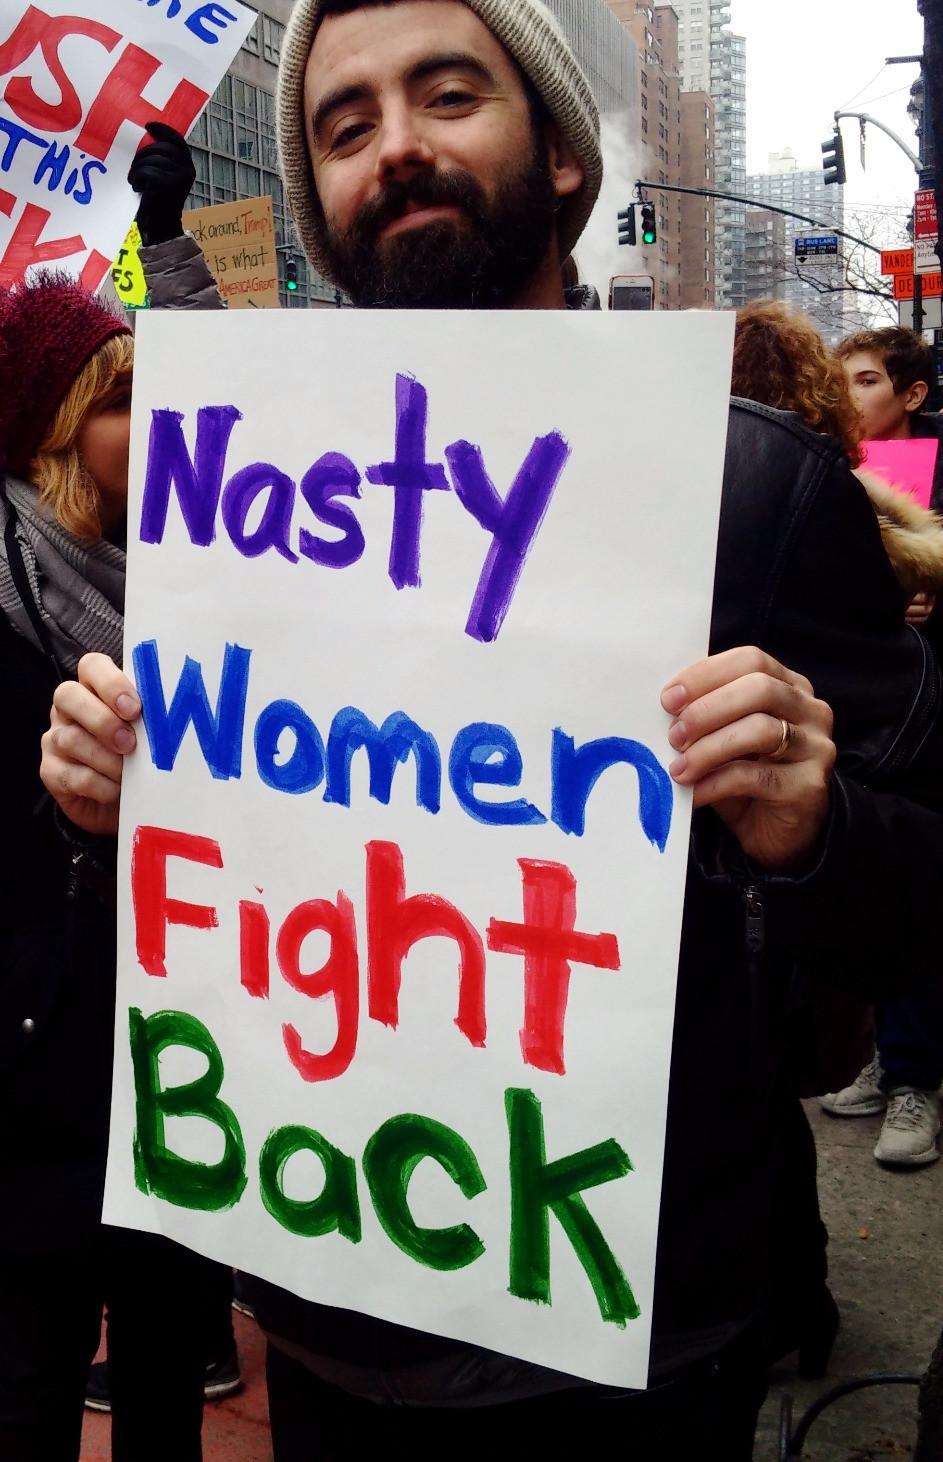 Man holding sign Nasty Women Fight Back